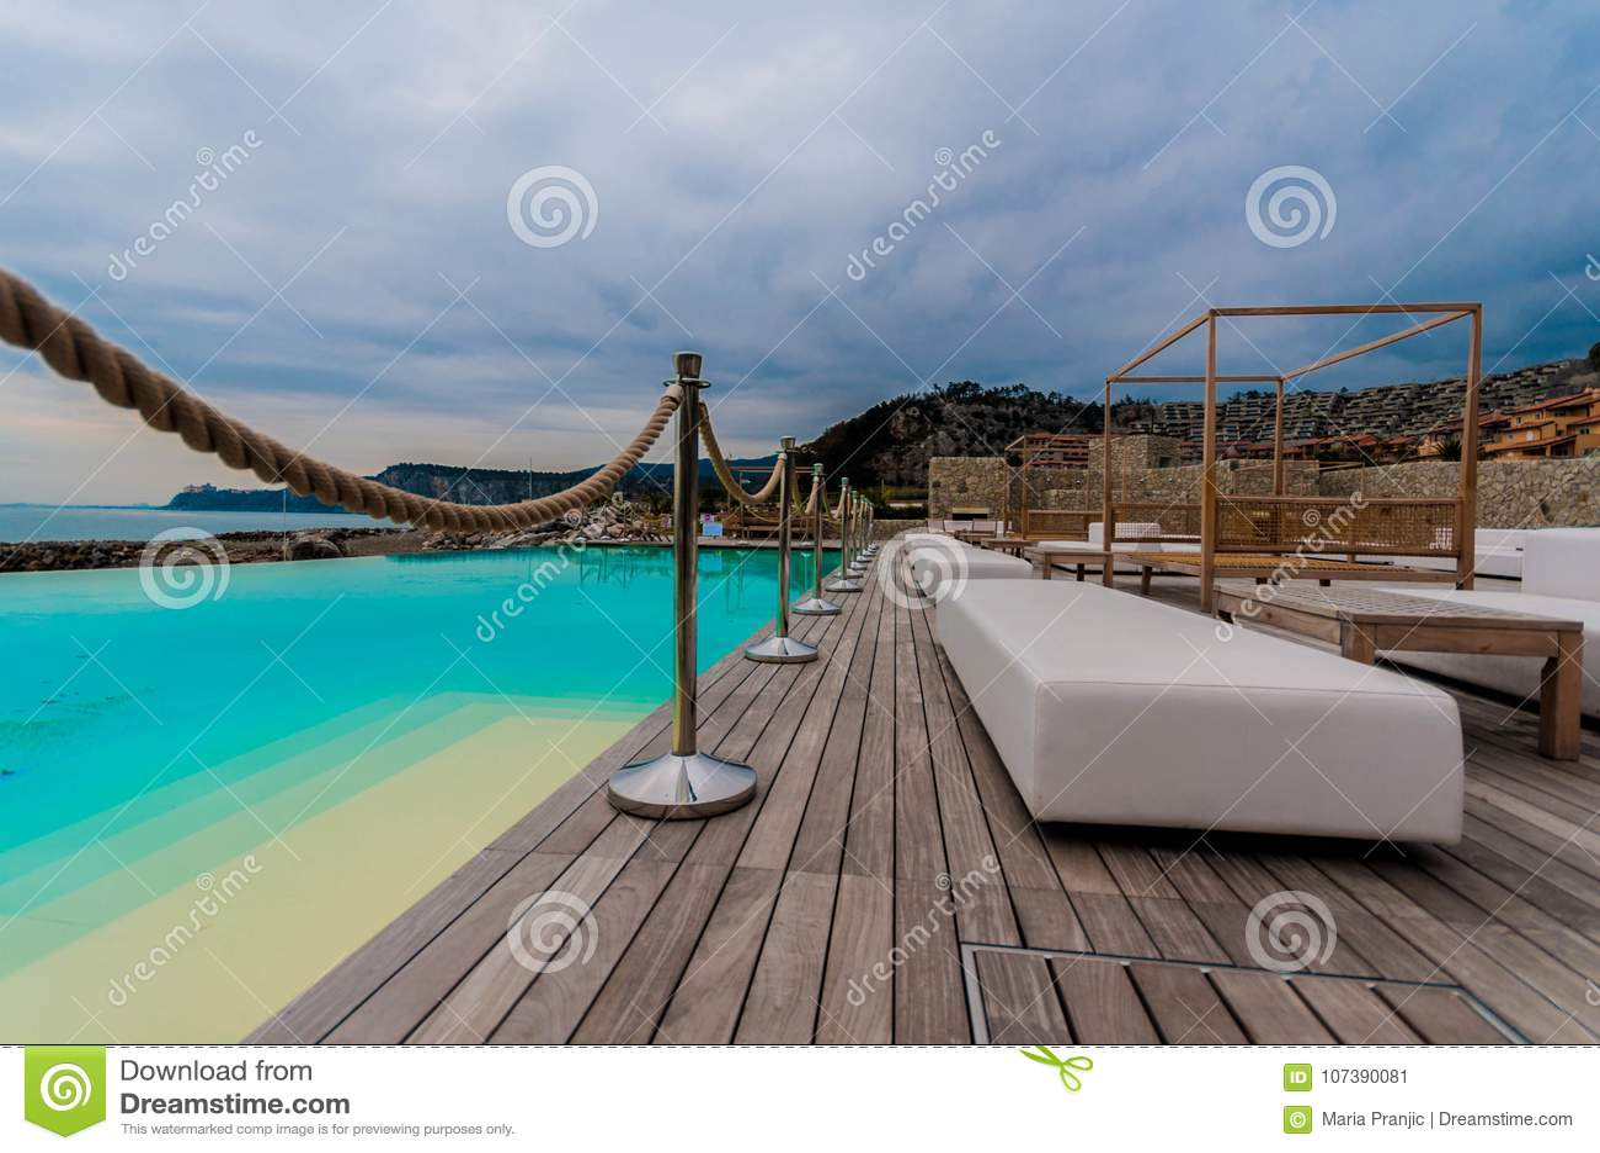 Luxury terace on beach